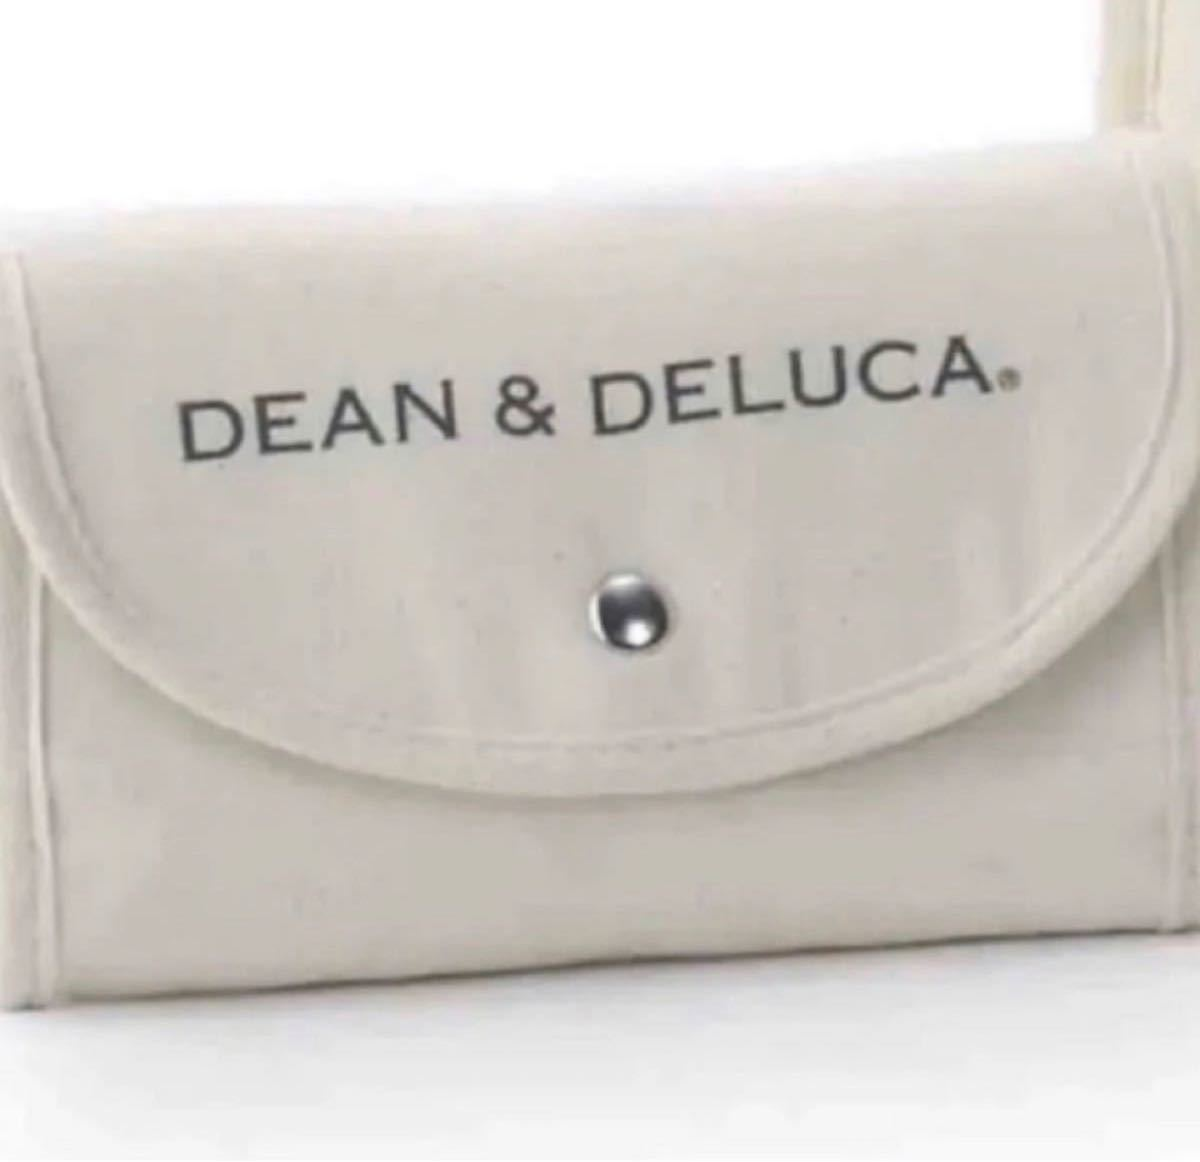 DEAN&DELUCA ショッピングバッグ エコバッグ ディーンアンドデルーカ ディーンデルーカ